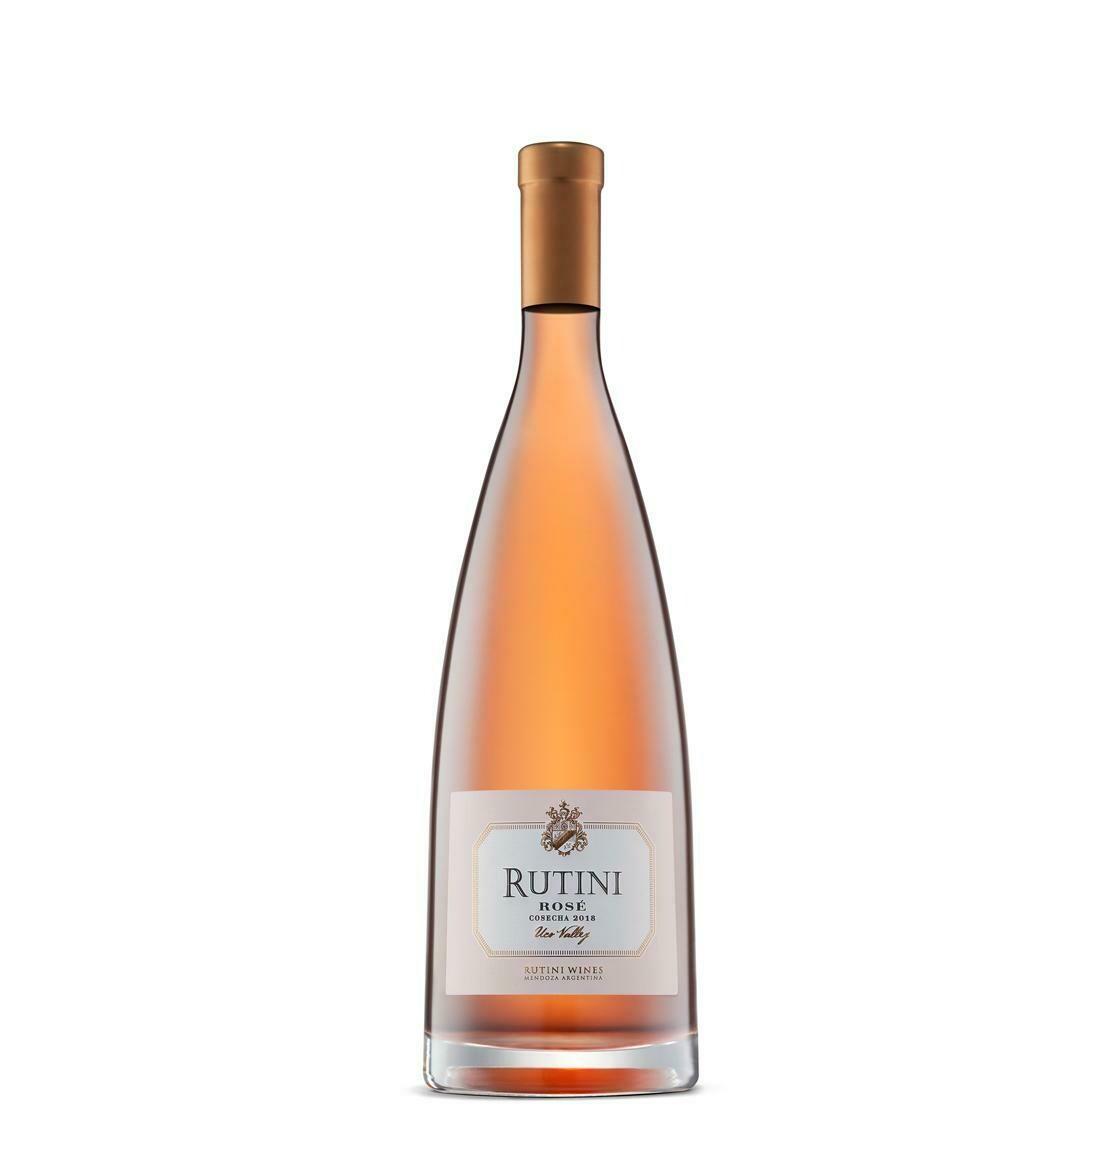 Vino Rutini rose x750cc